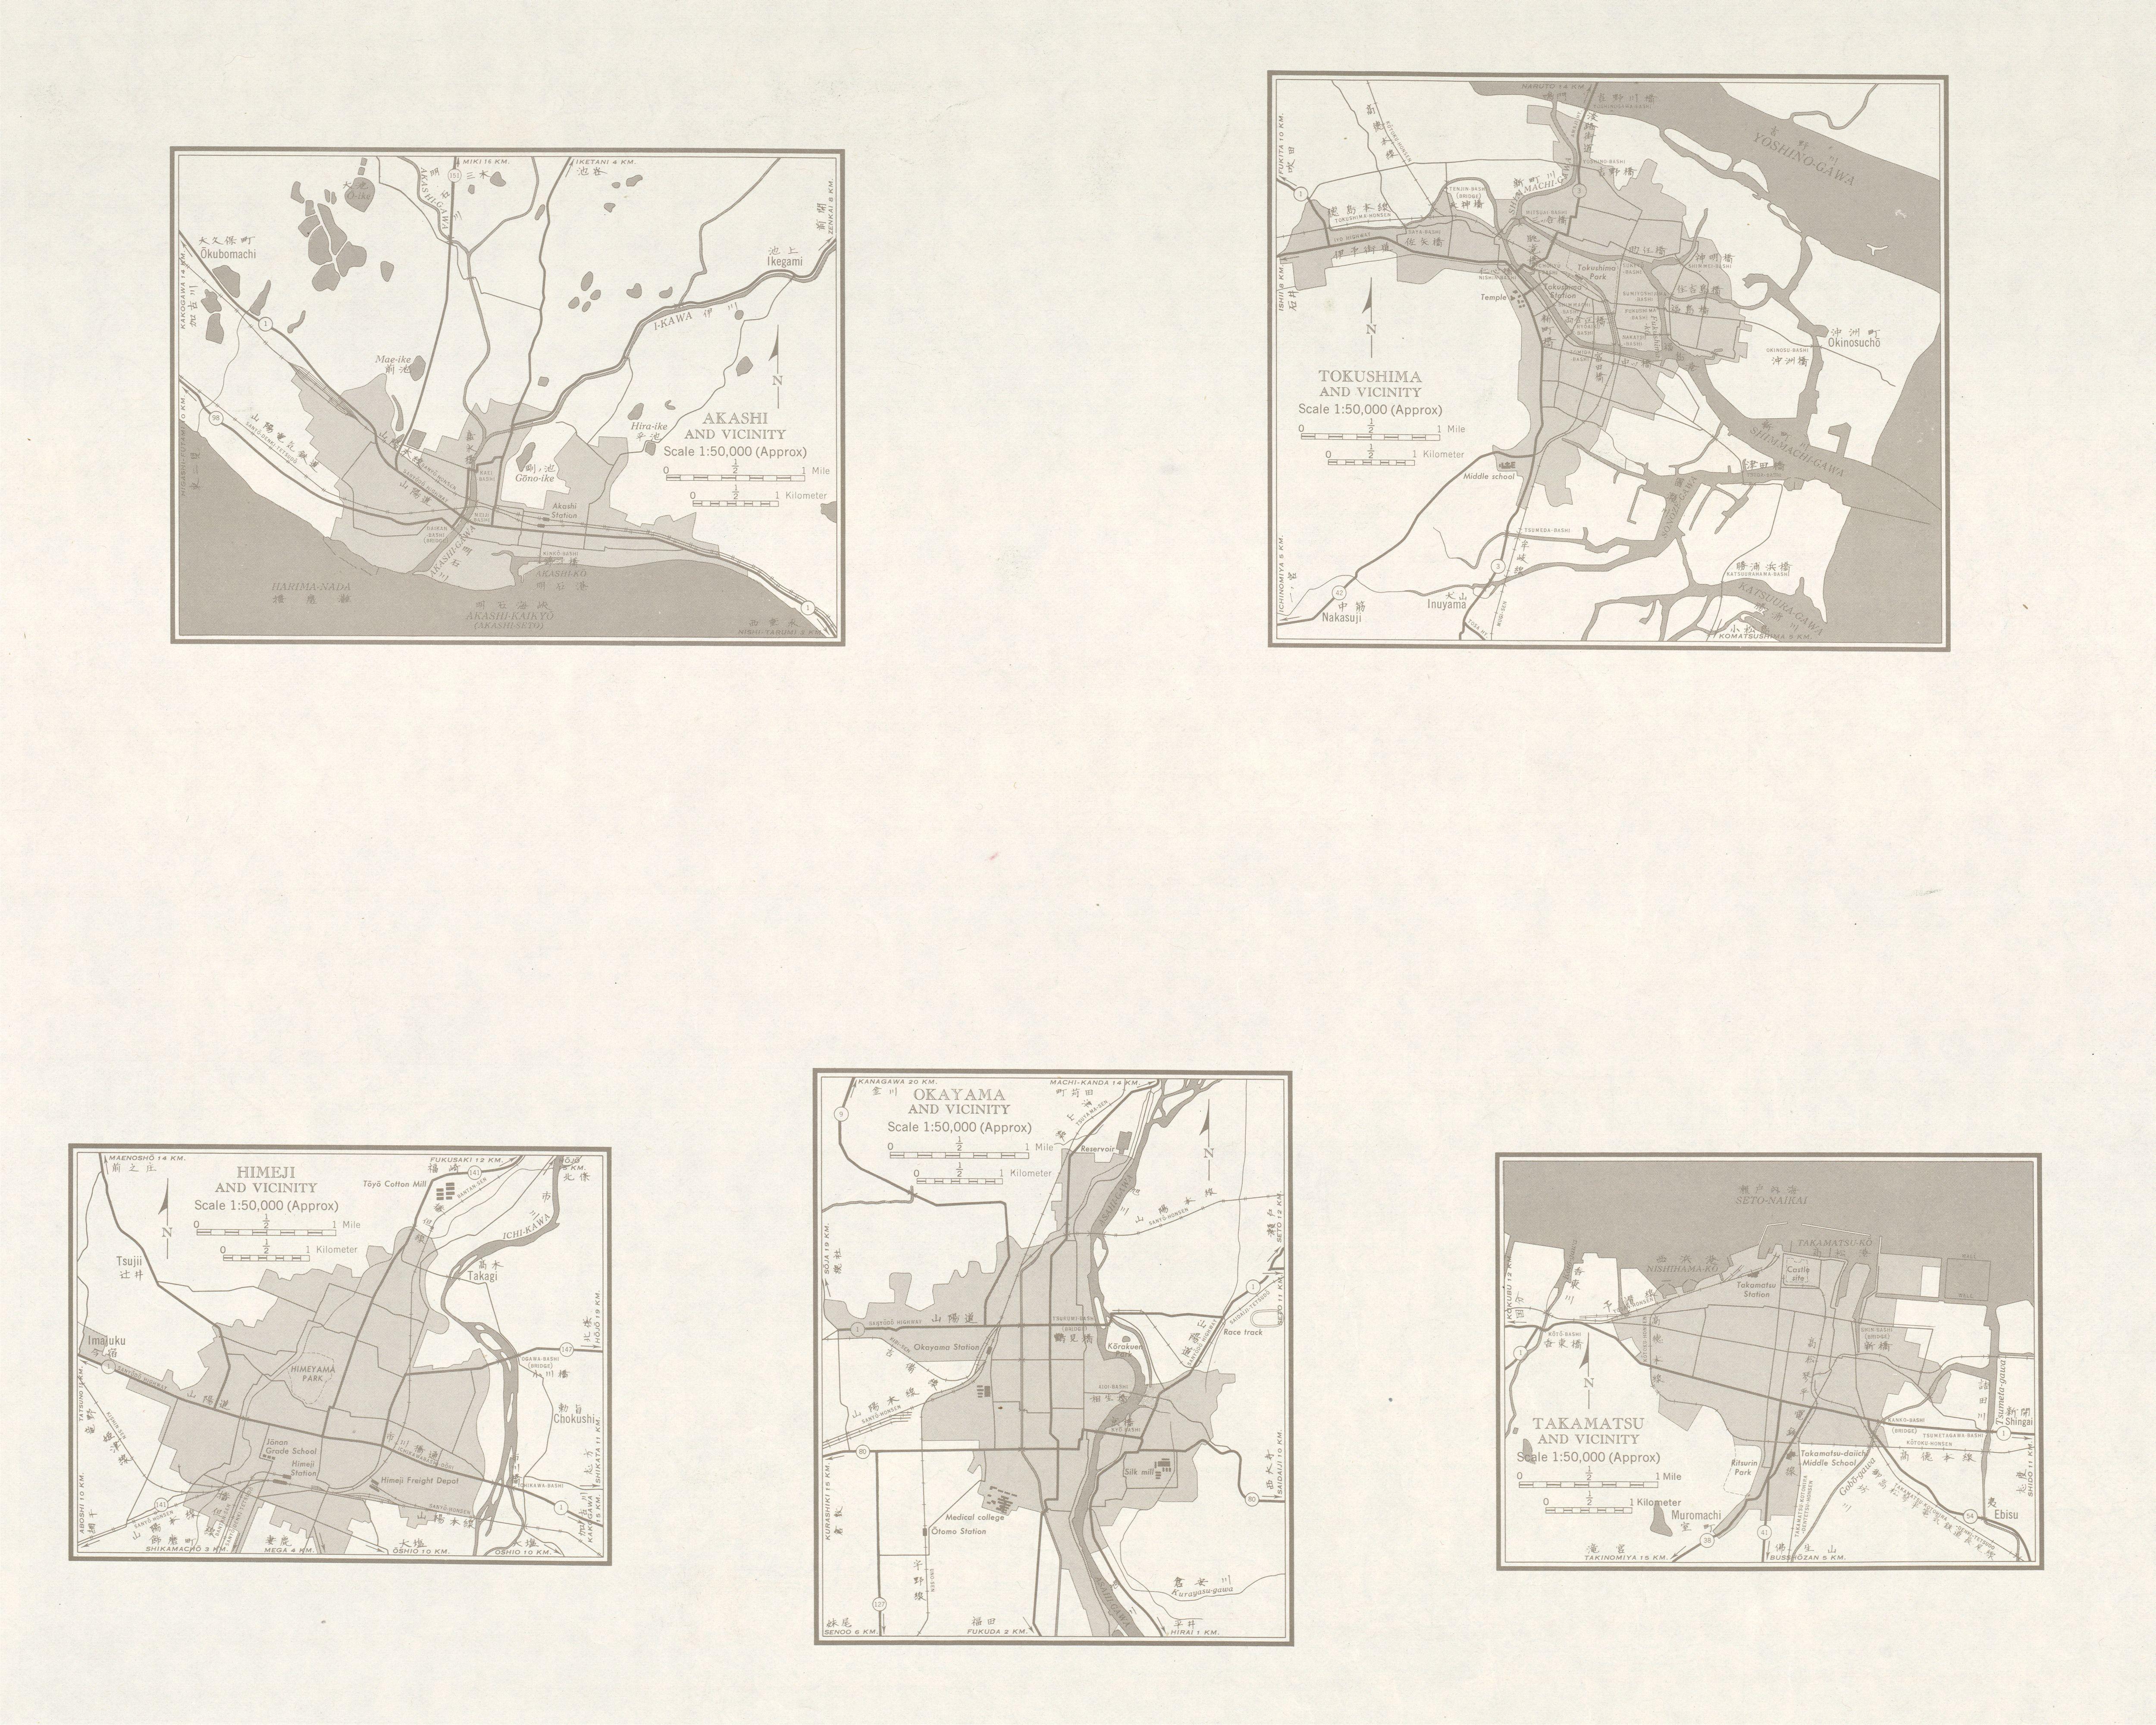 Mapas de Akashi, Tokushima, Himeji y sus Cercanias, Japón 1954